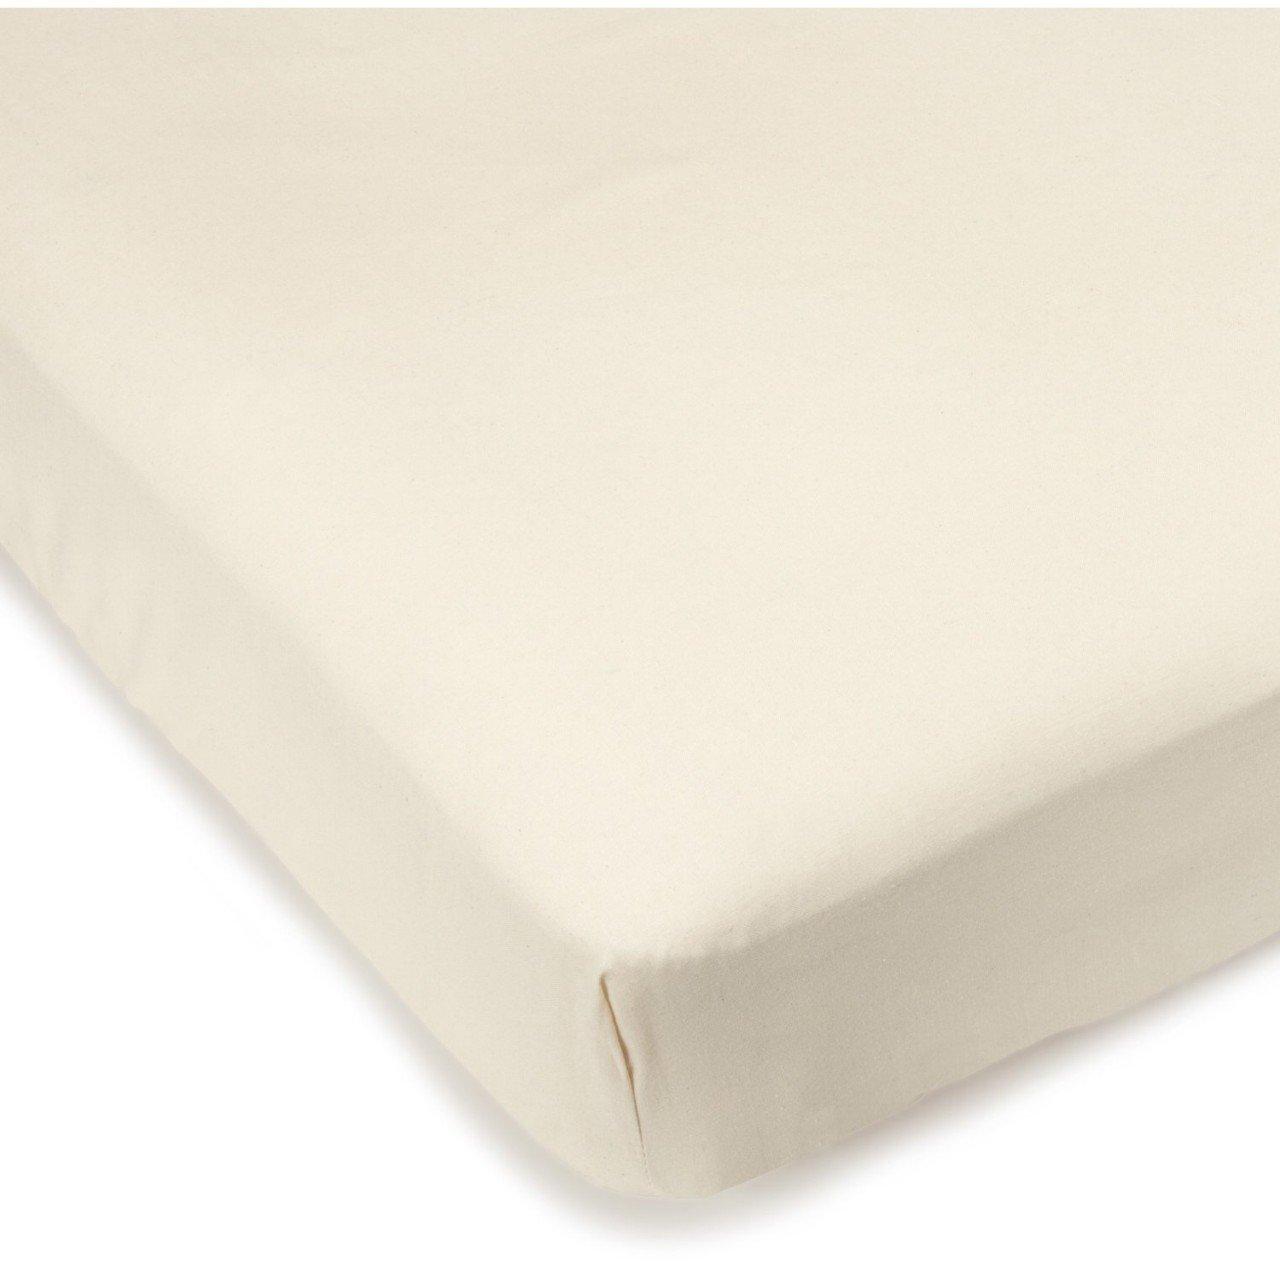 Sleeper Sofa Mattress Encasement Size: Sofa Sleeper Full